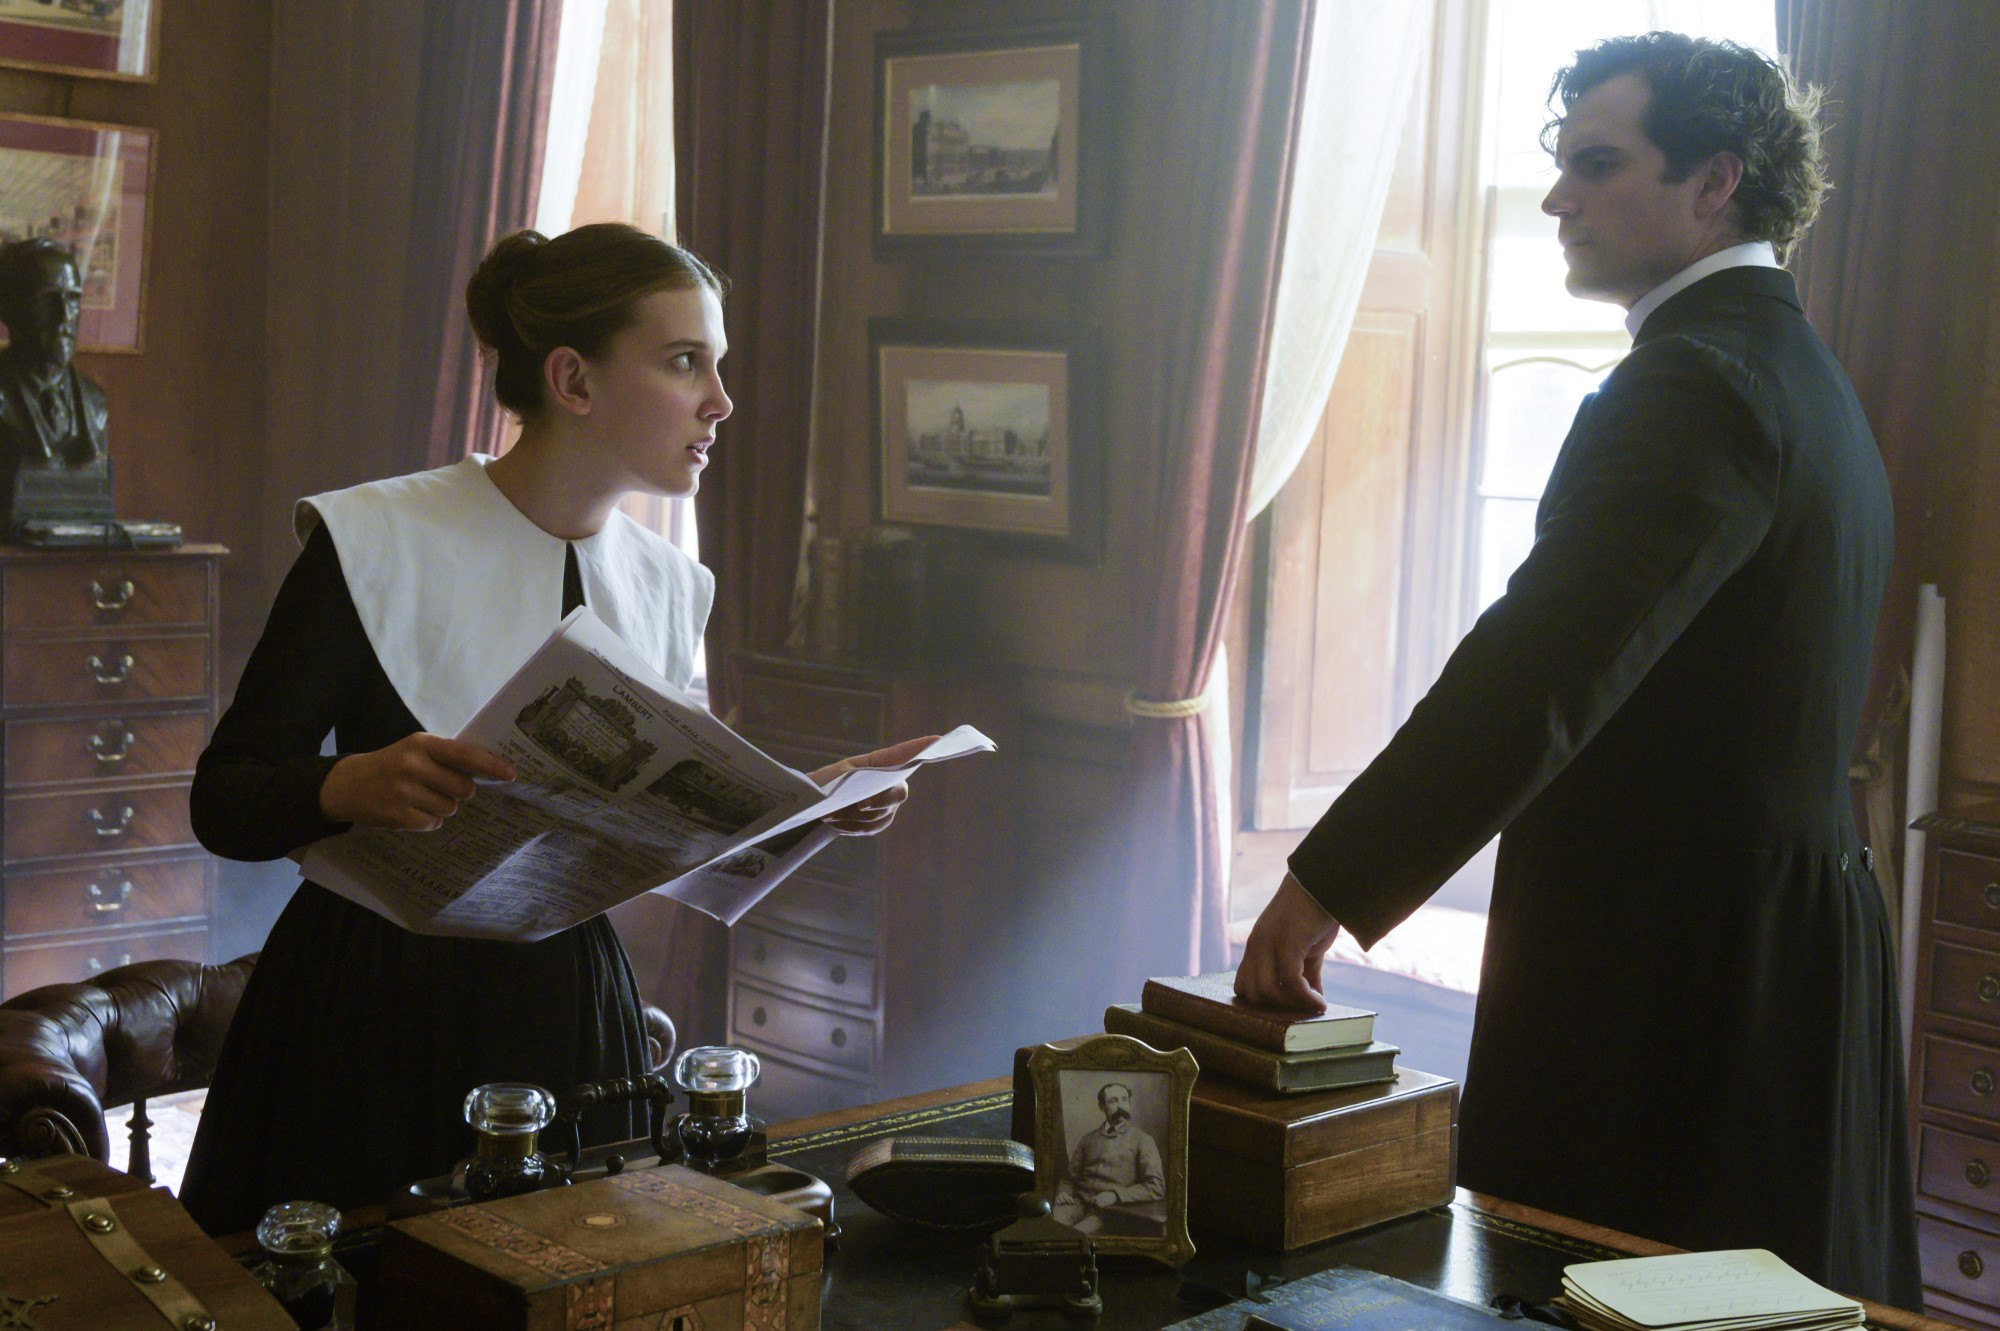 Netflix September slate: Tom Holland's The Devil All the Time, Millie Bobby Brown's Enola Holmes, & more 16